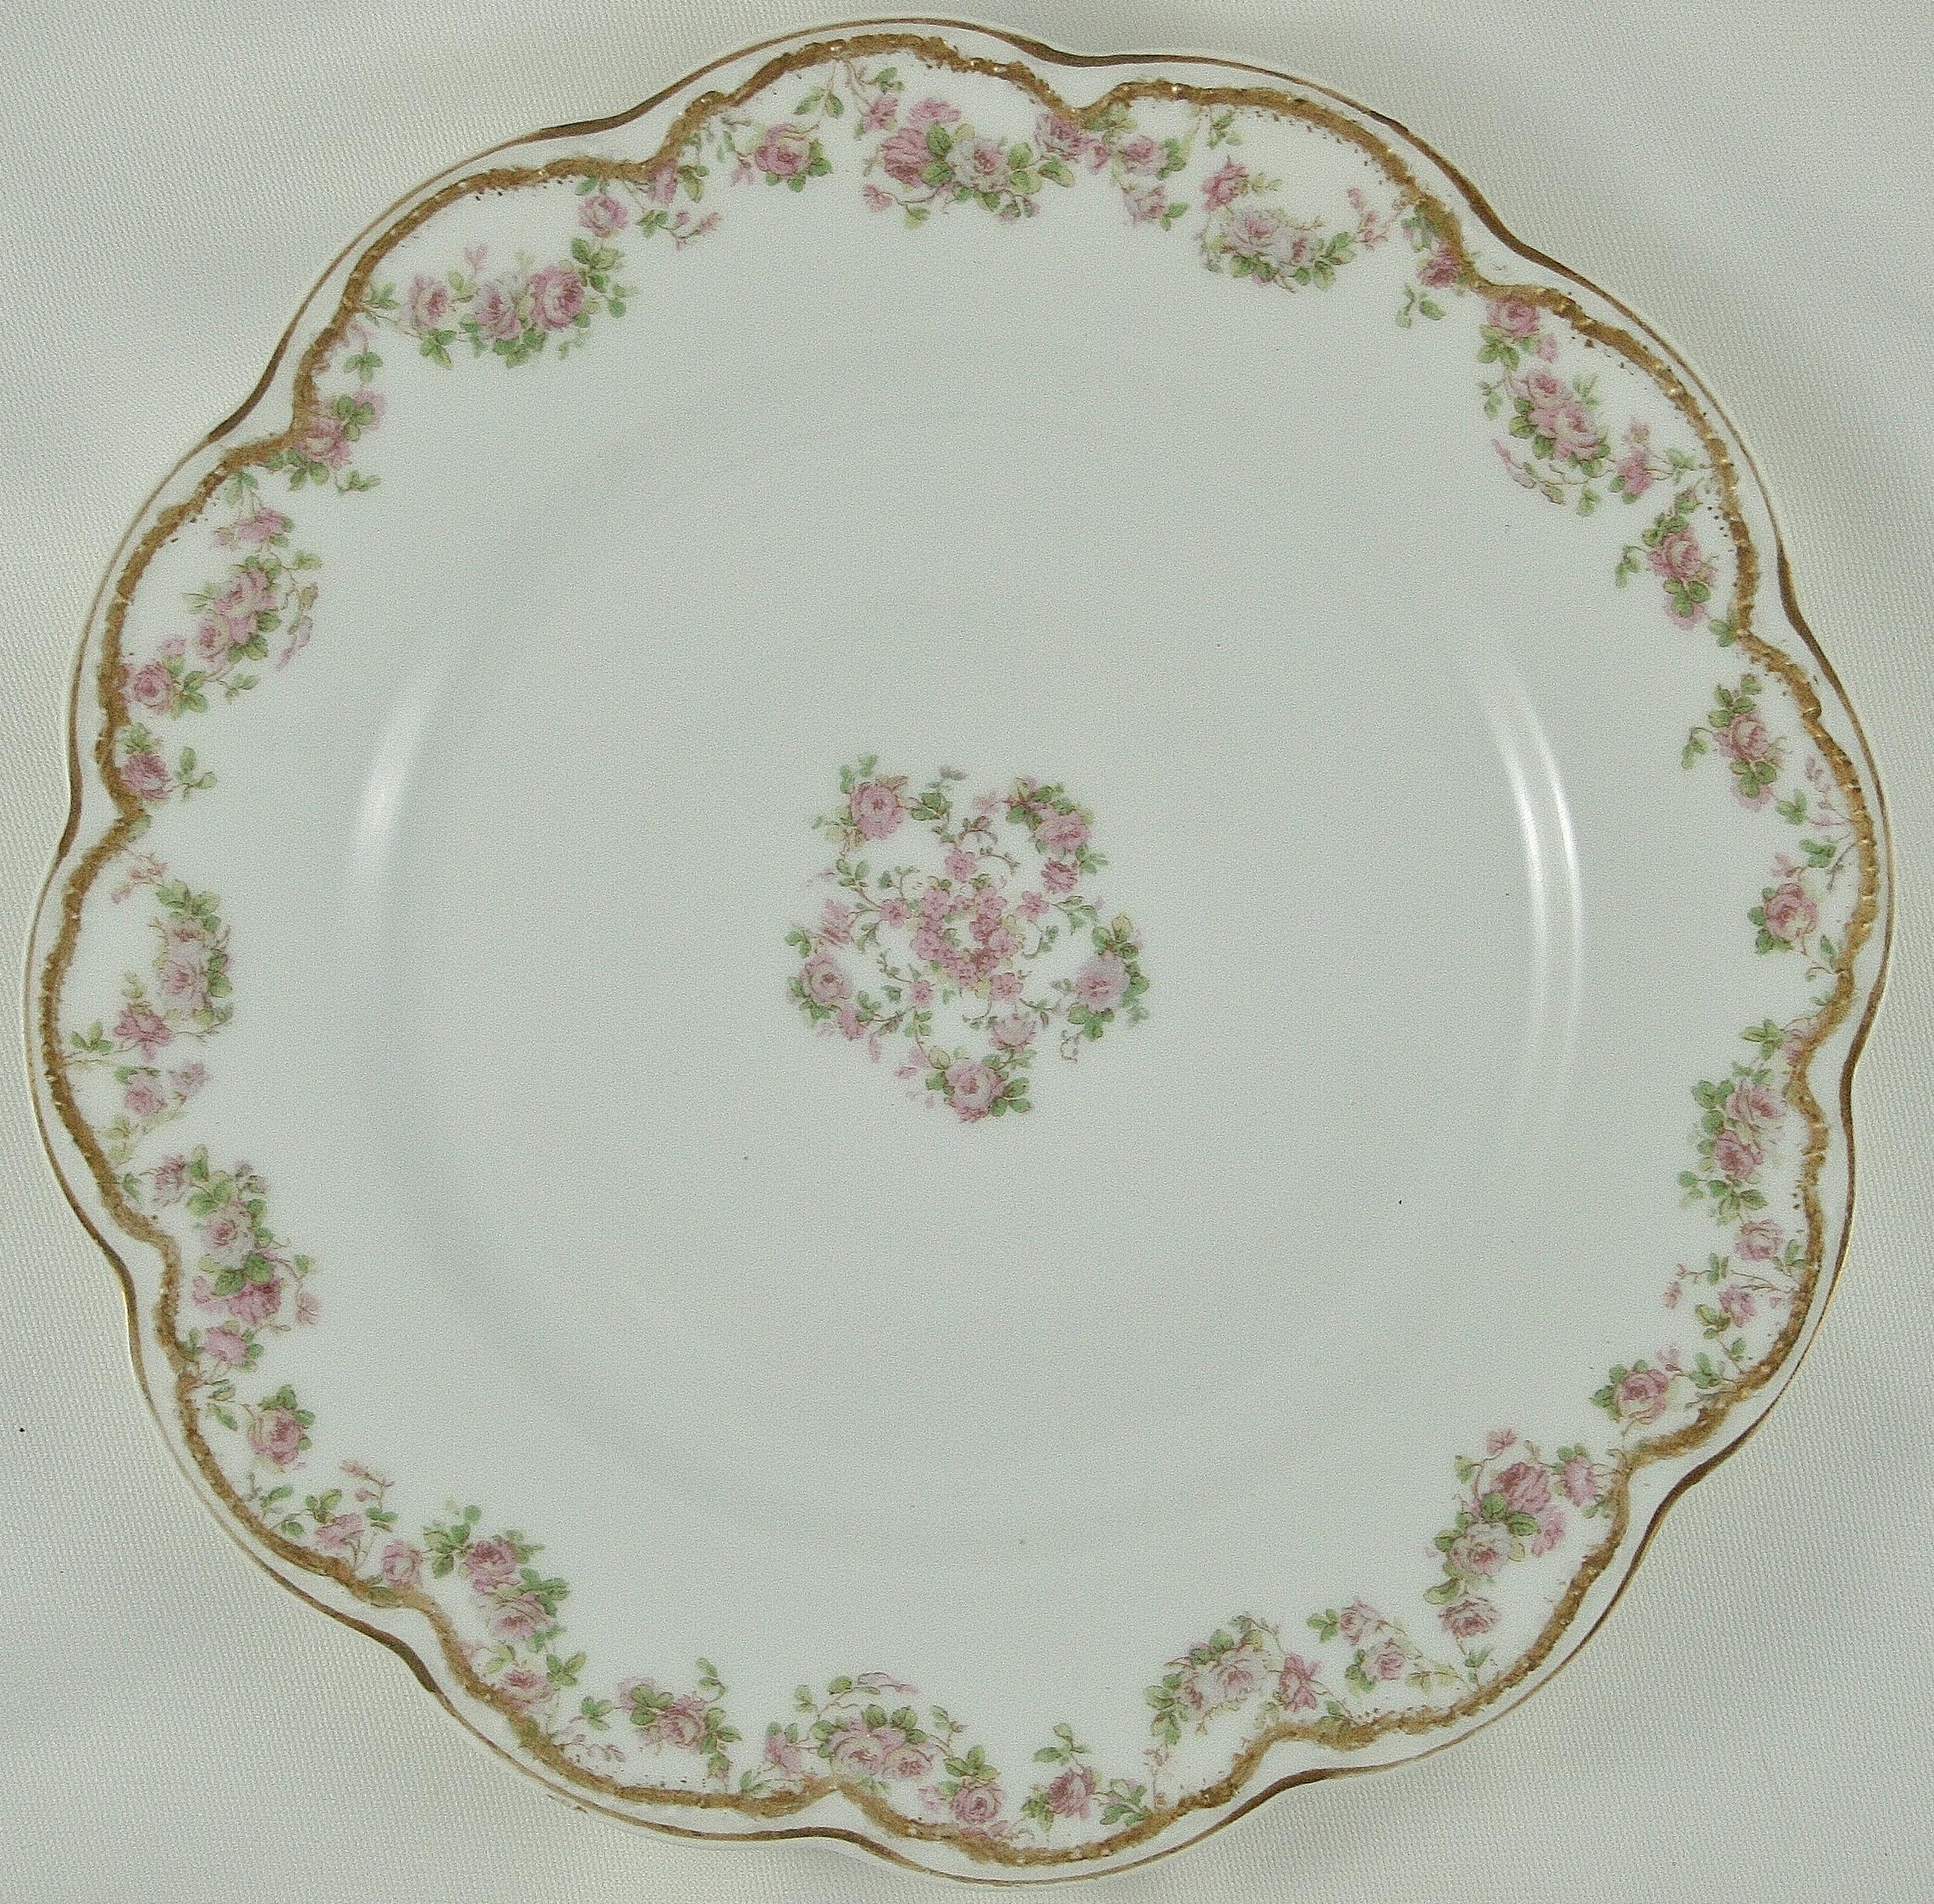 Vintage pink china plate